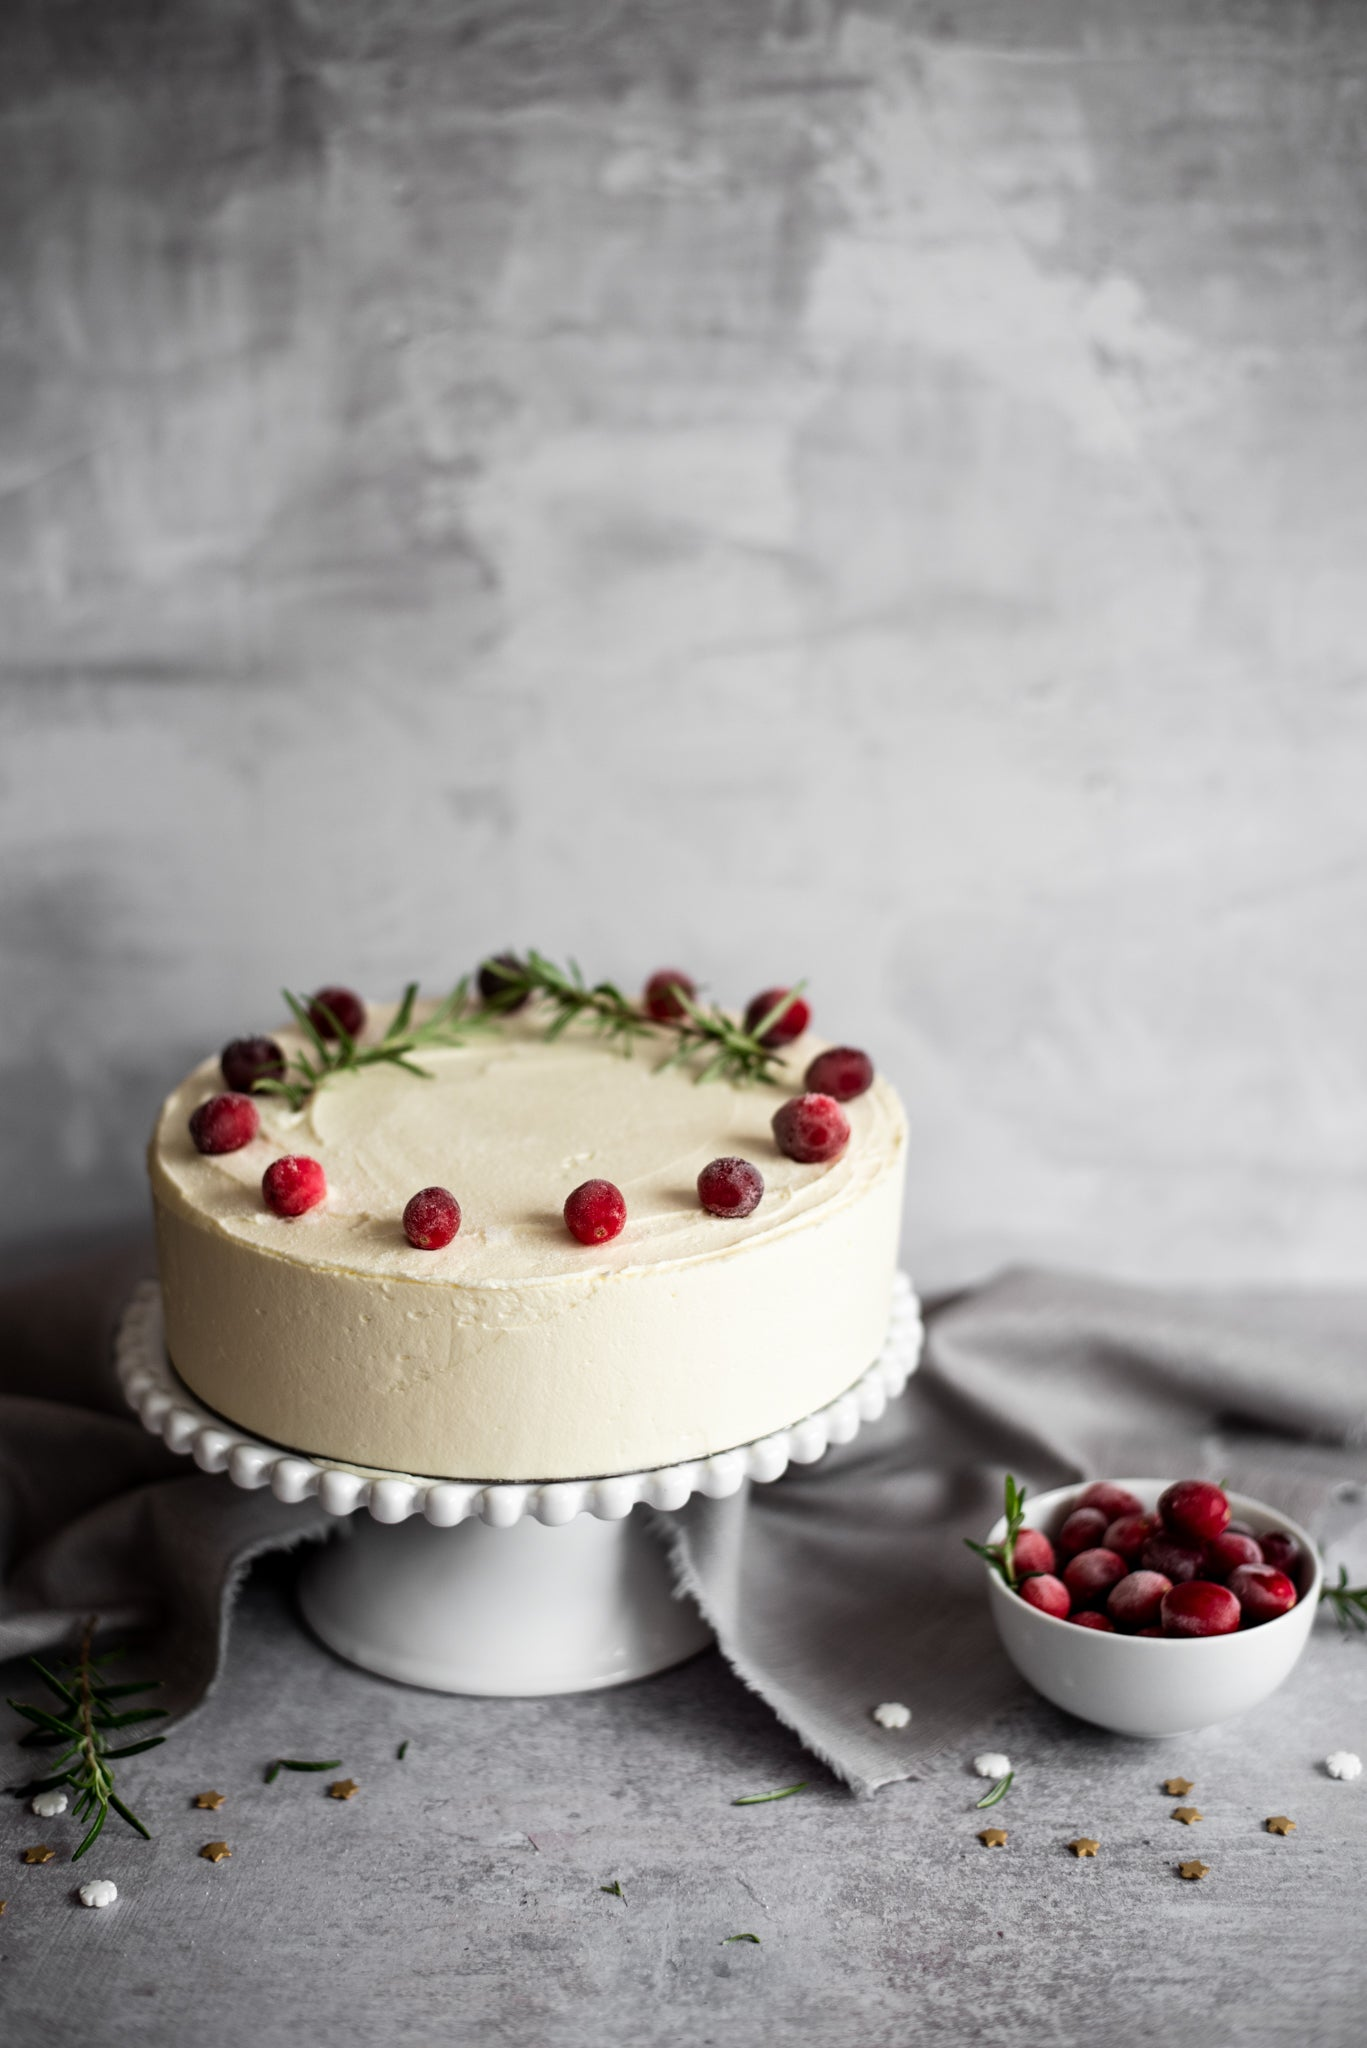 Snowy-White-Christmas-Cake-WEB-RES-4.jpg